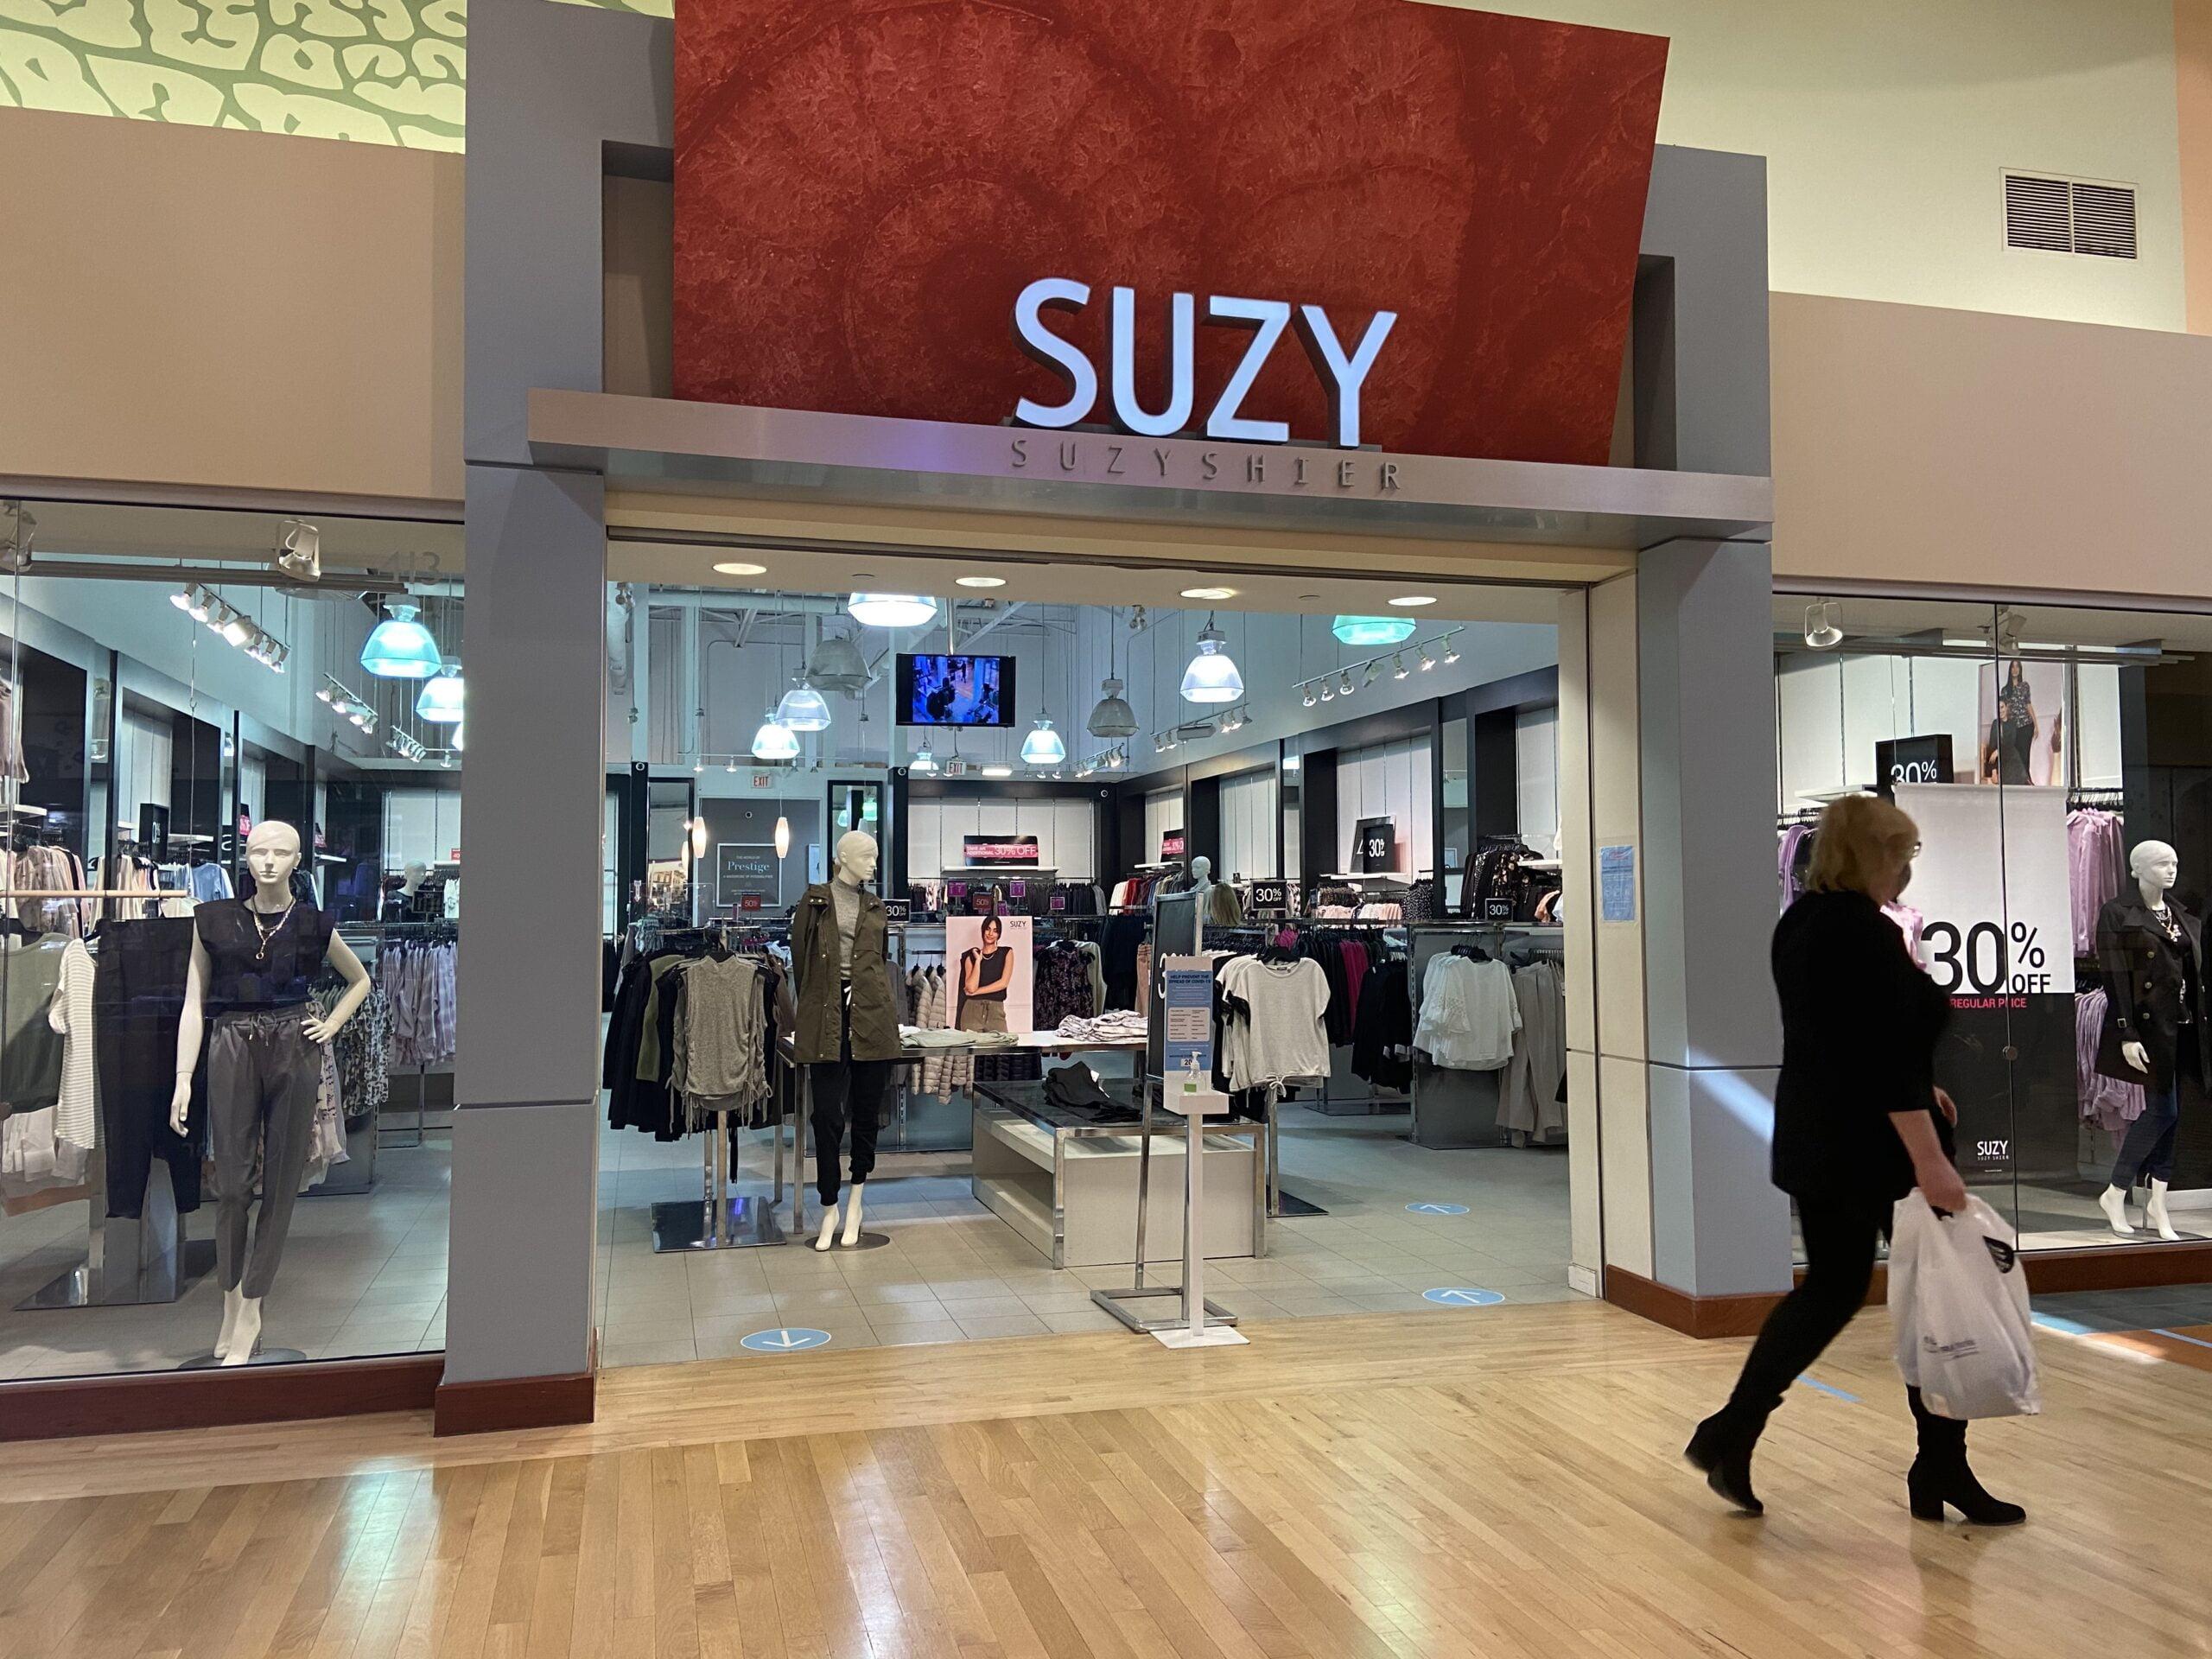 Suzy Shier at CrossIron Mills